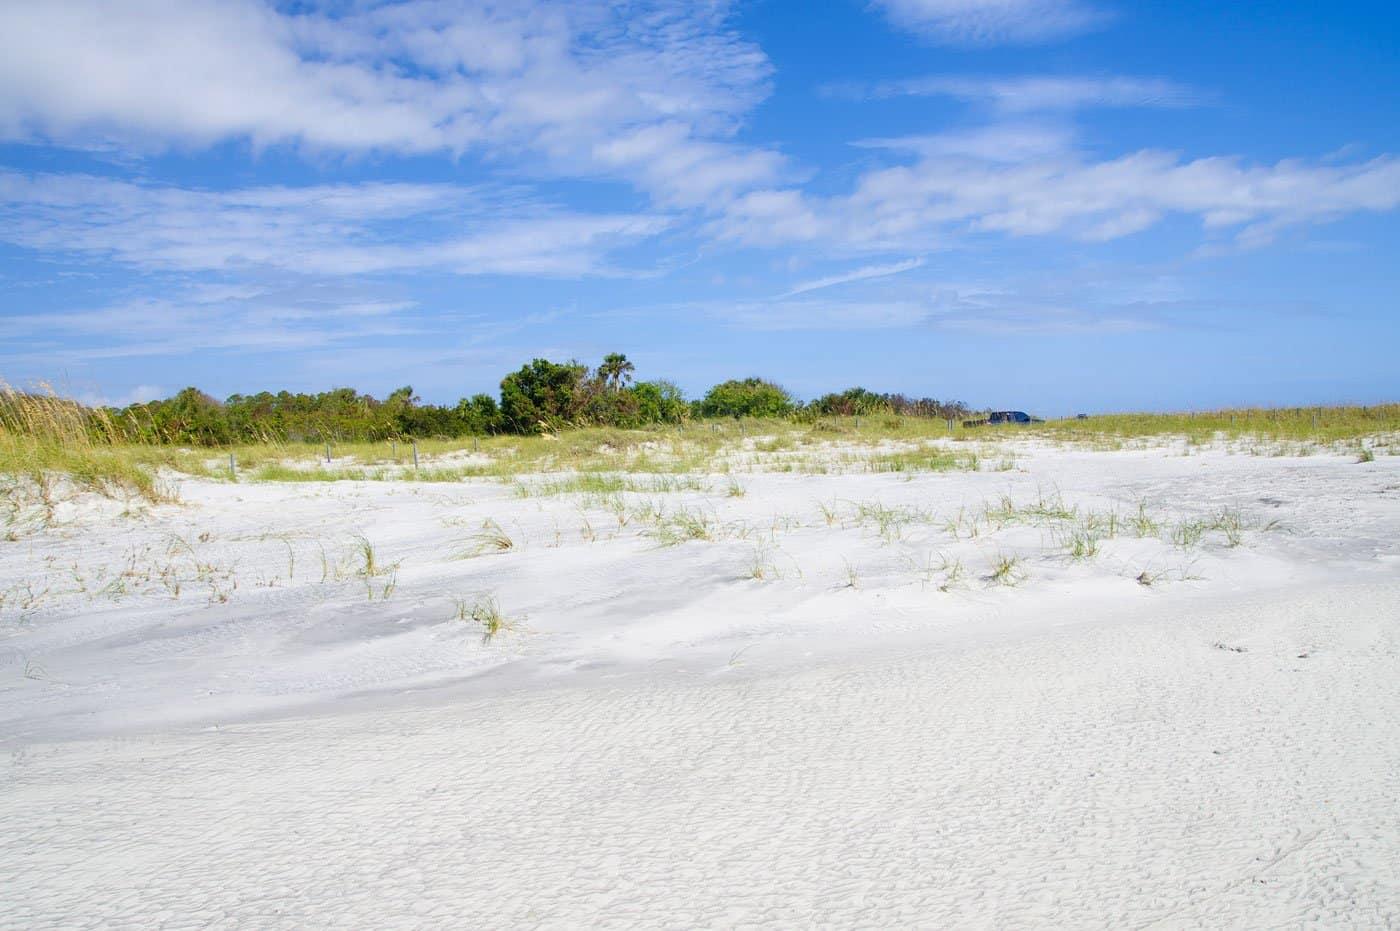 AmeliaIslandFloridaFernandinaBeachisoccupiedbywildbirdsFloridaUSA best beaches